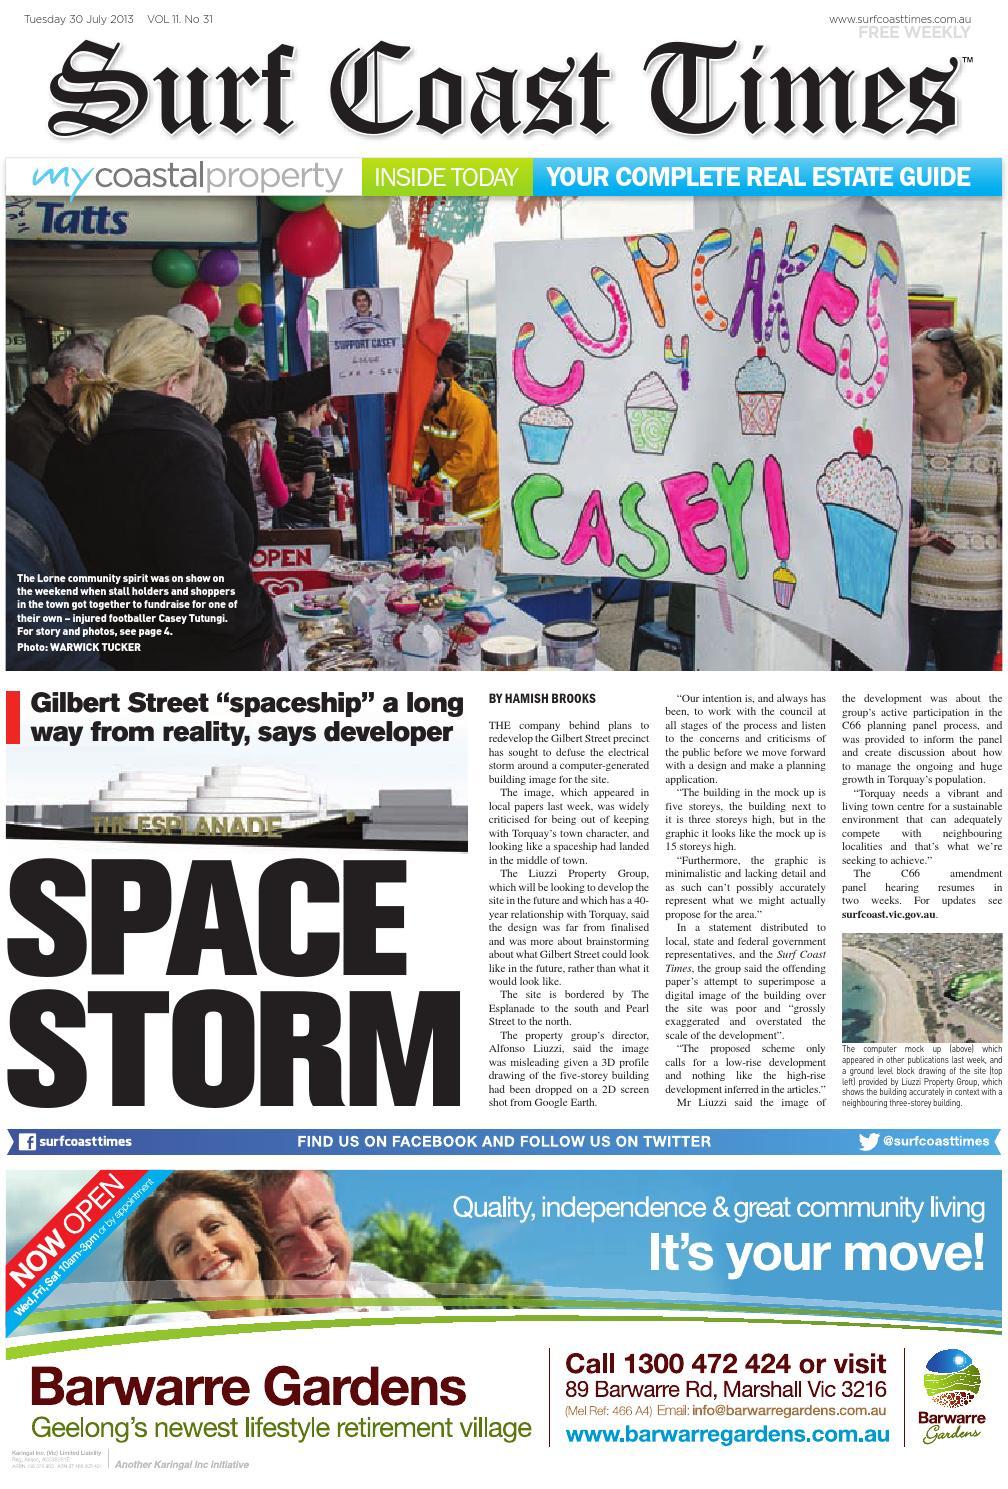 Surf Coast Times July 30 2013 By Surf Coast News Australia Pty Ltd